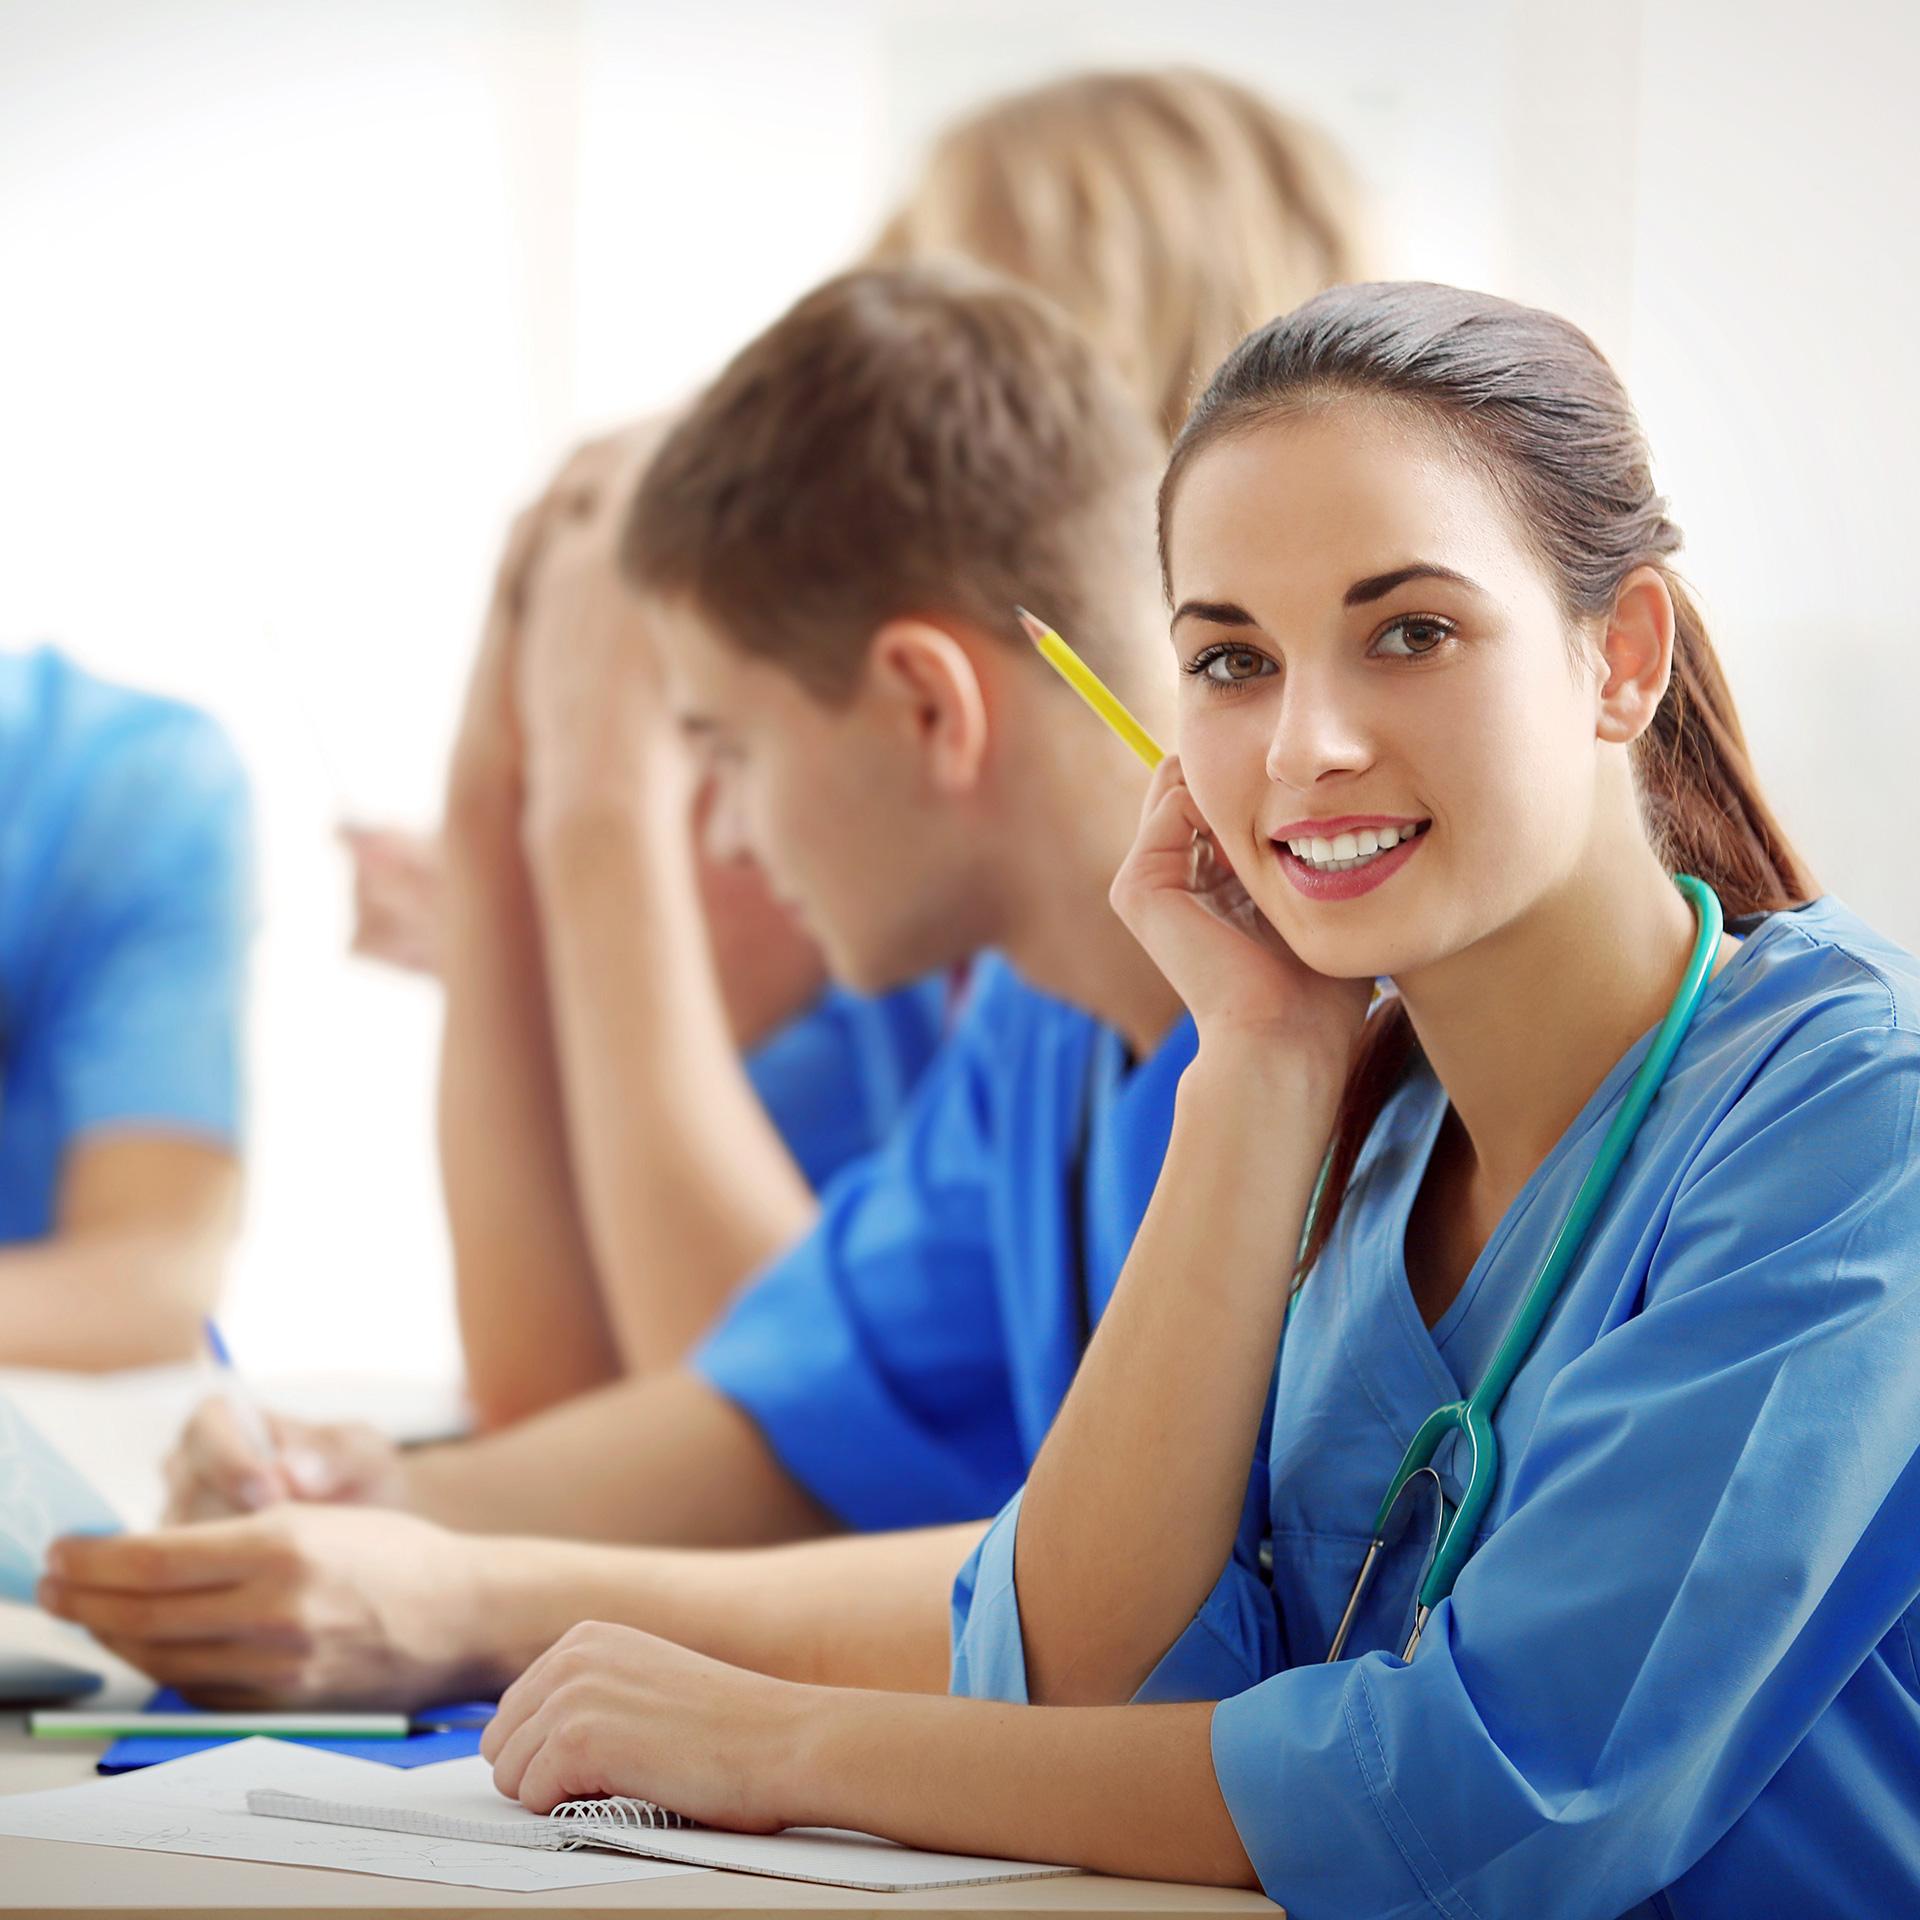 Hausärzte im A4, Gemeinschaftspraxis – Karriere, Ausbildung